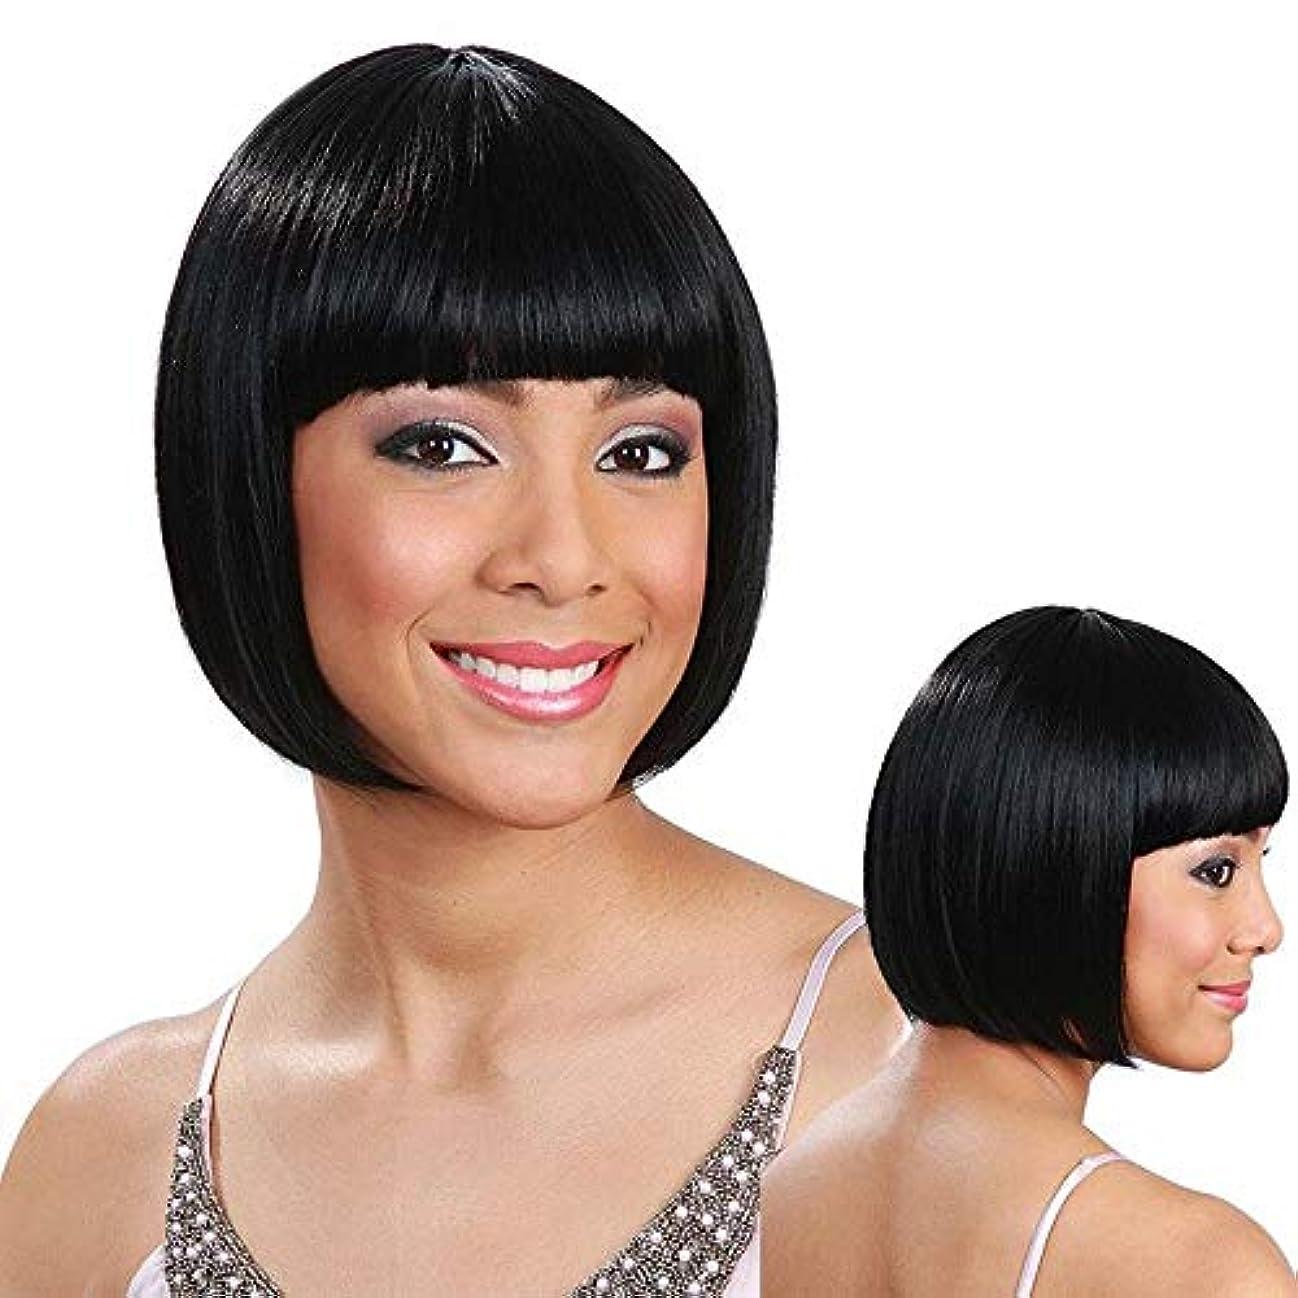 WASAIO レディースショートカーリーウィッグショートボブウィッグブラックストレートヘア (色 : 黒)